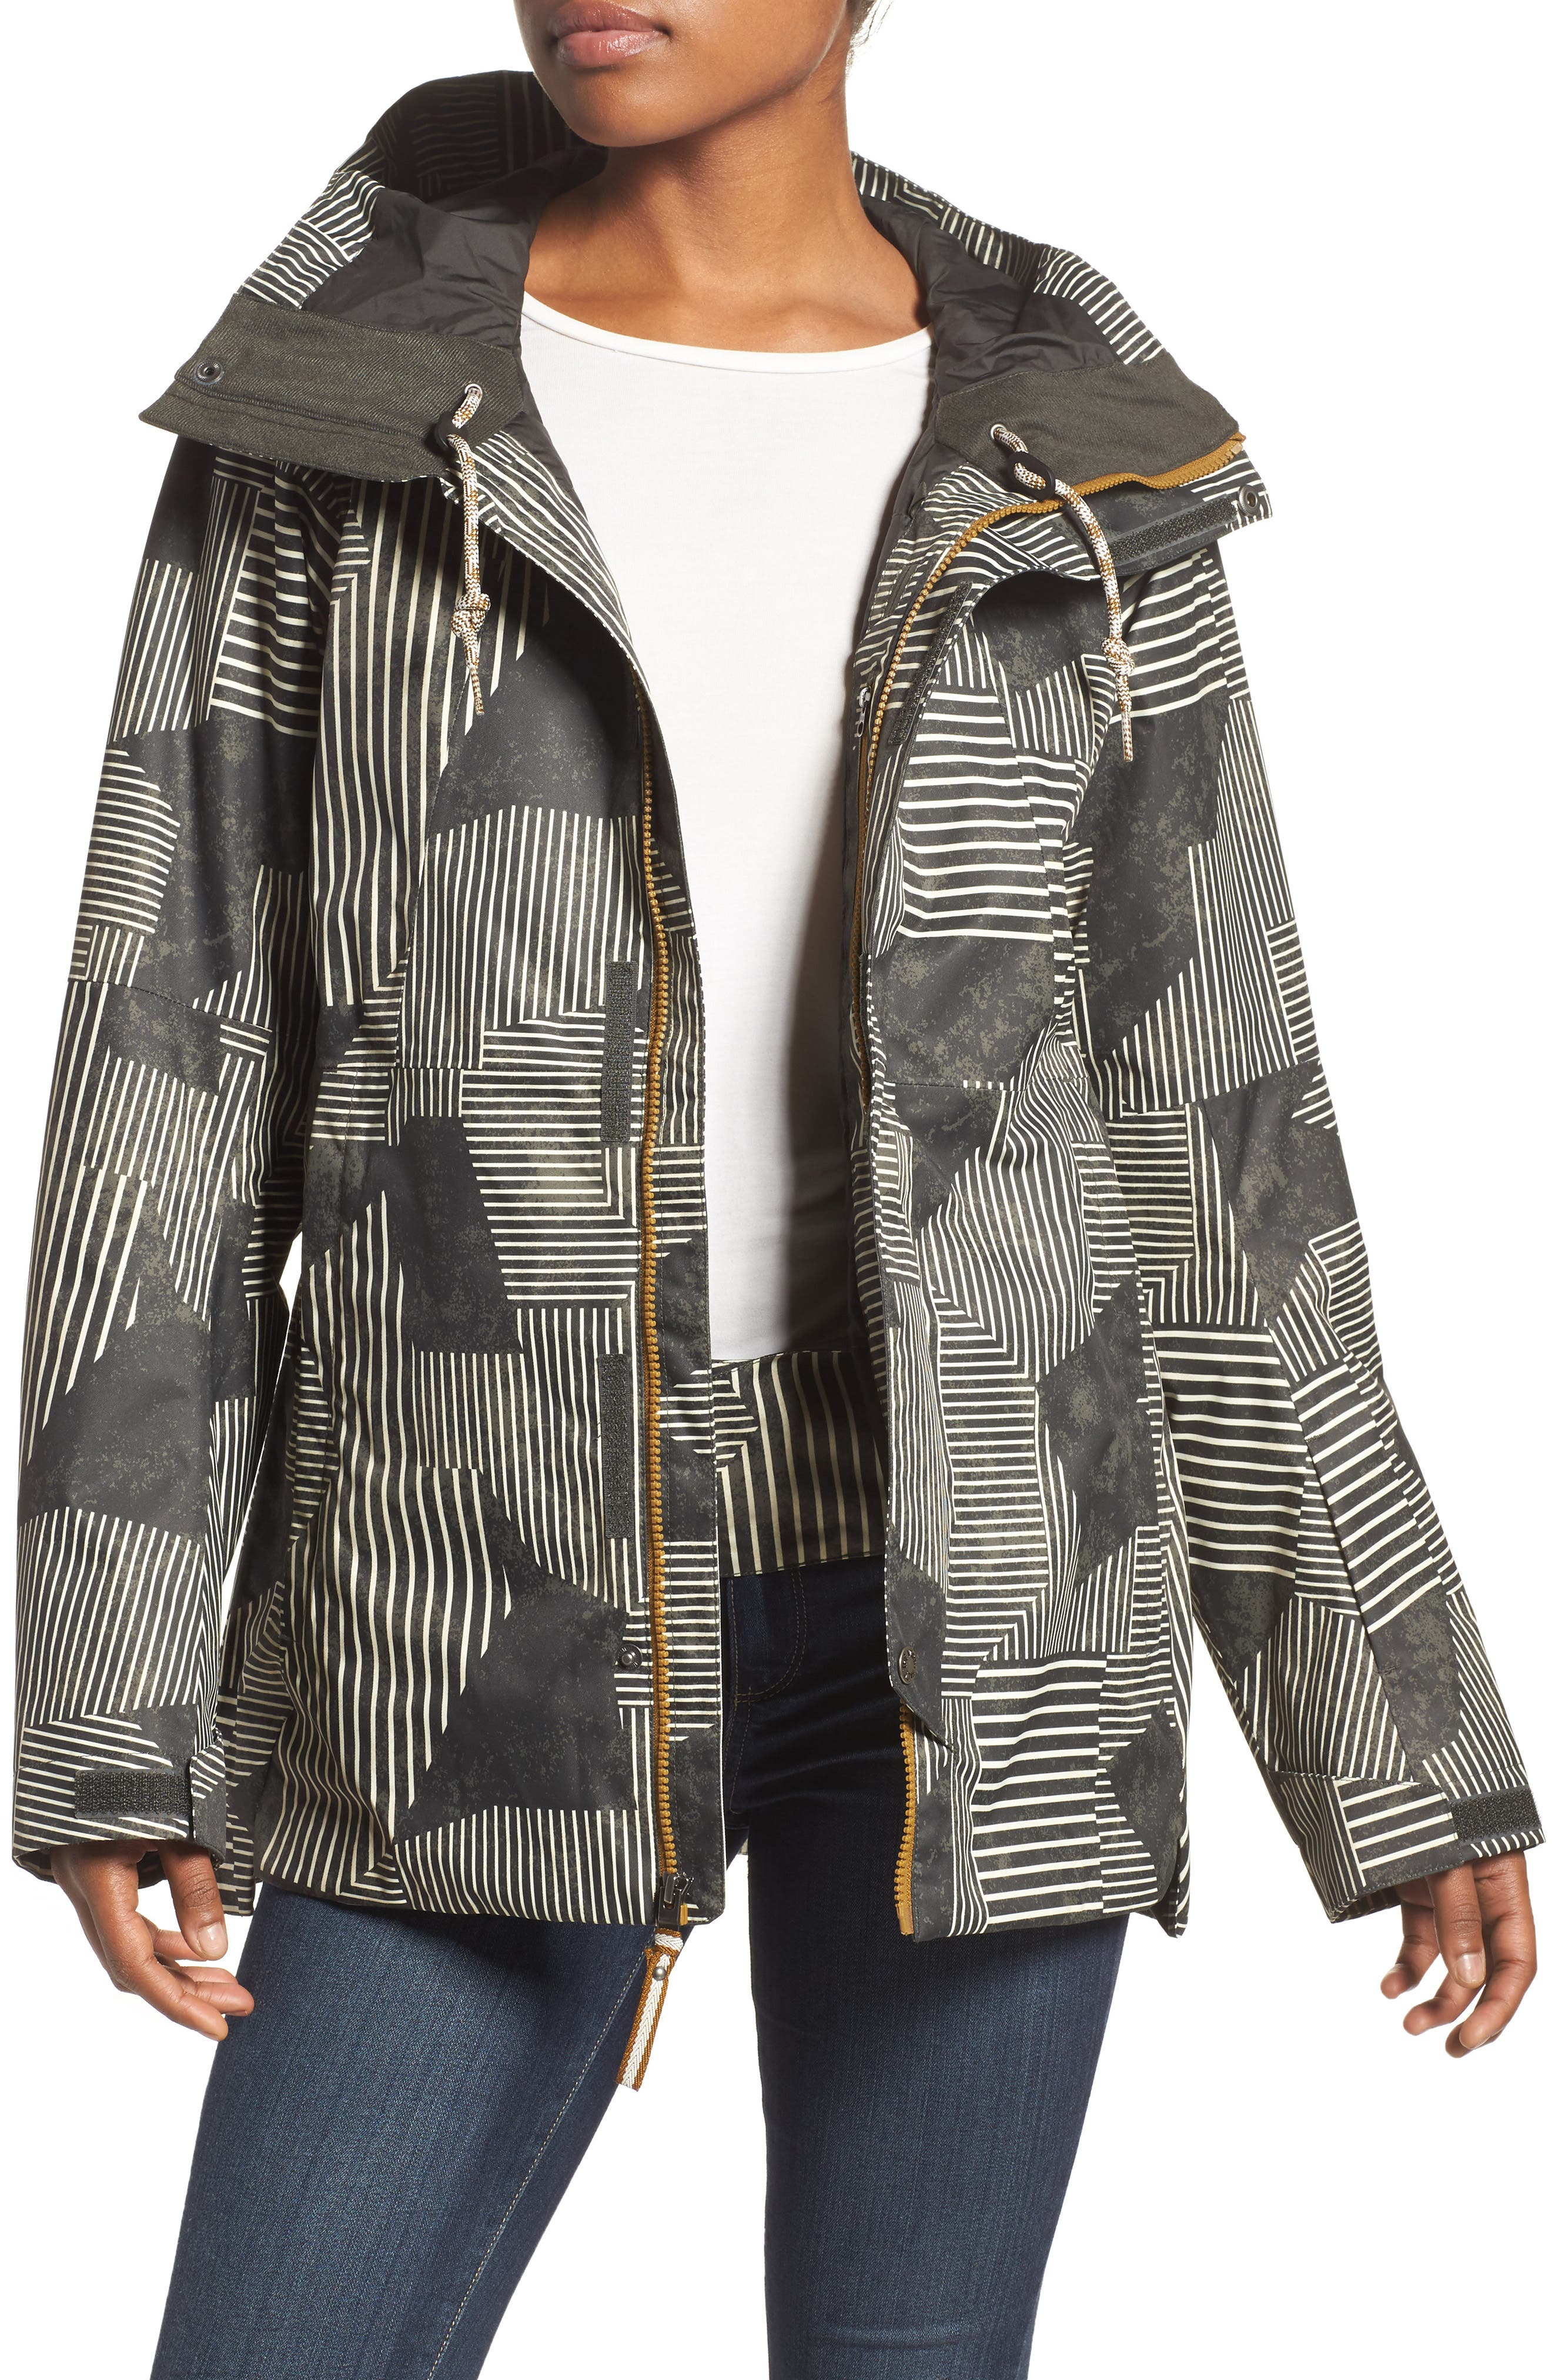 Superlu Weatherproof Hooded Ski Jacket,                         Main,                         color, 021